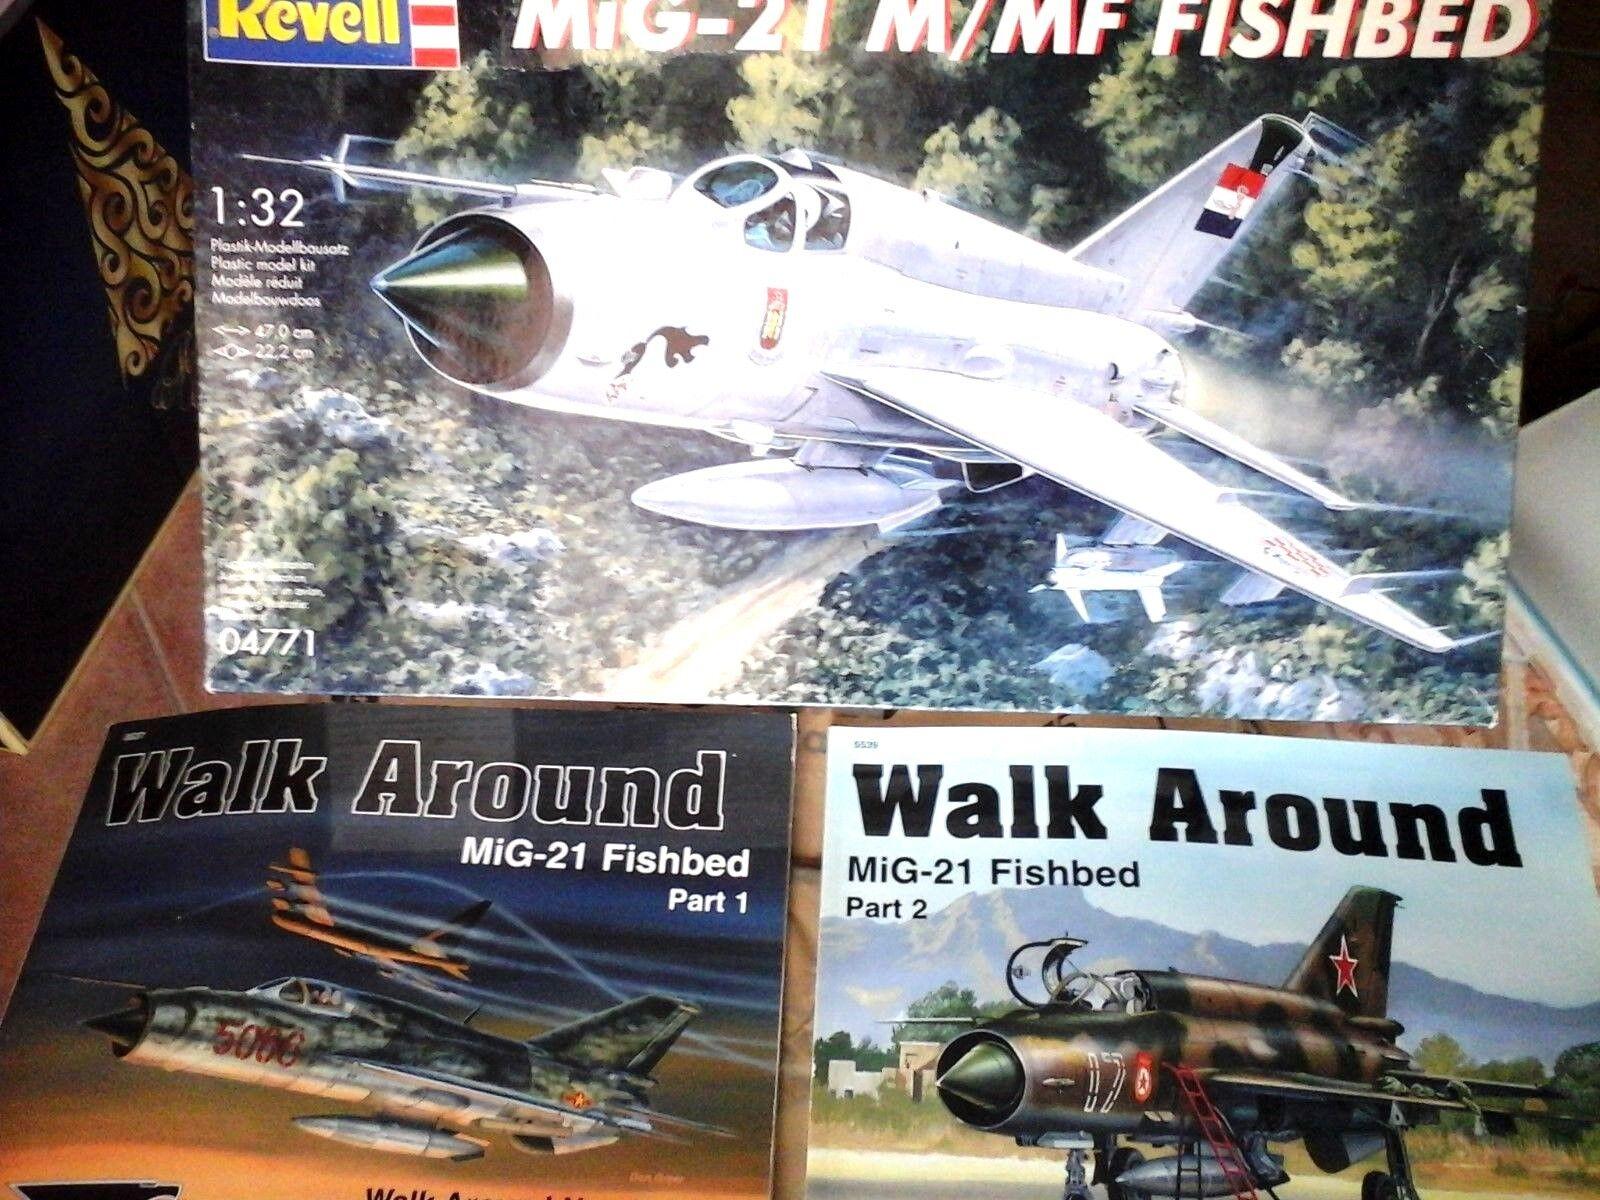 MIG-21 M MF FISHBED 1 32REVELL Modellll+N.2 SQUADRON SIGNAL WALK AROUND N.37&N.39